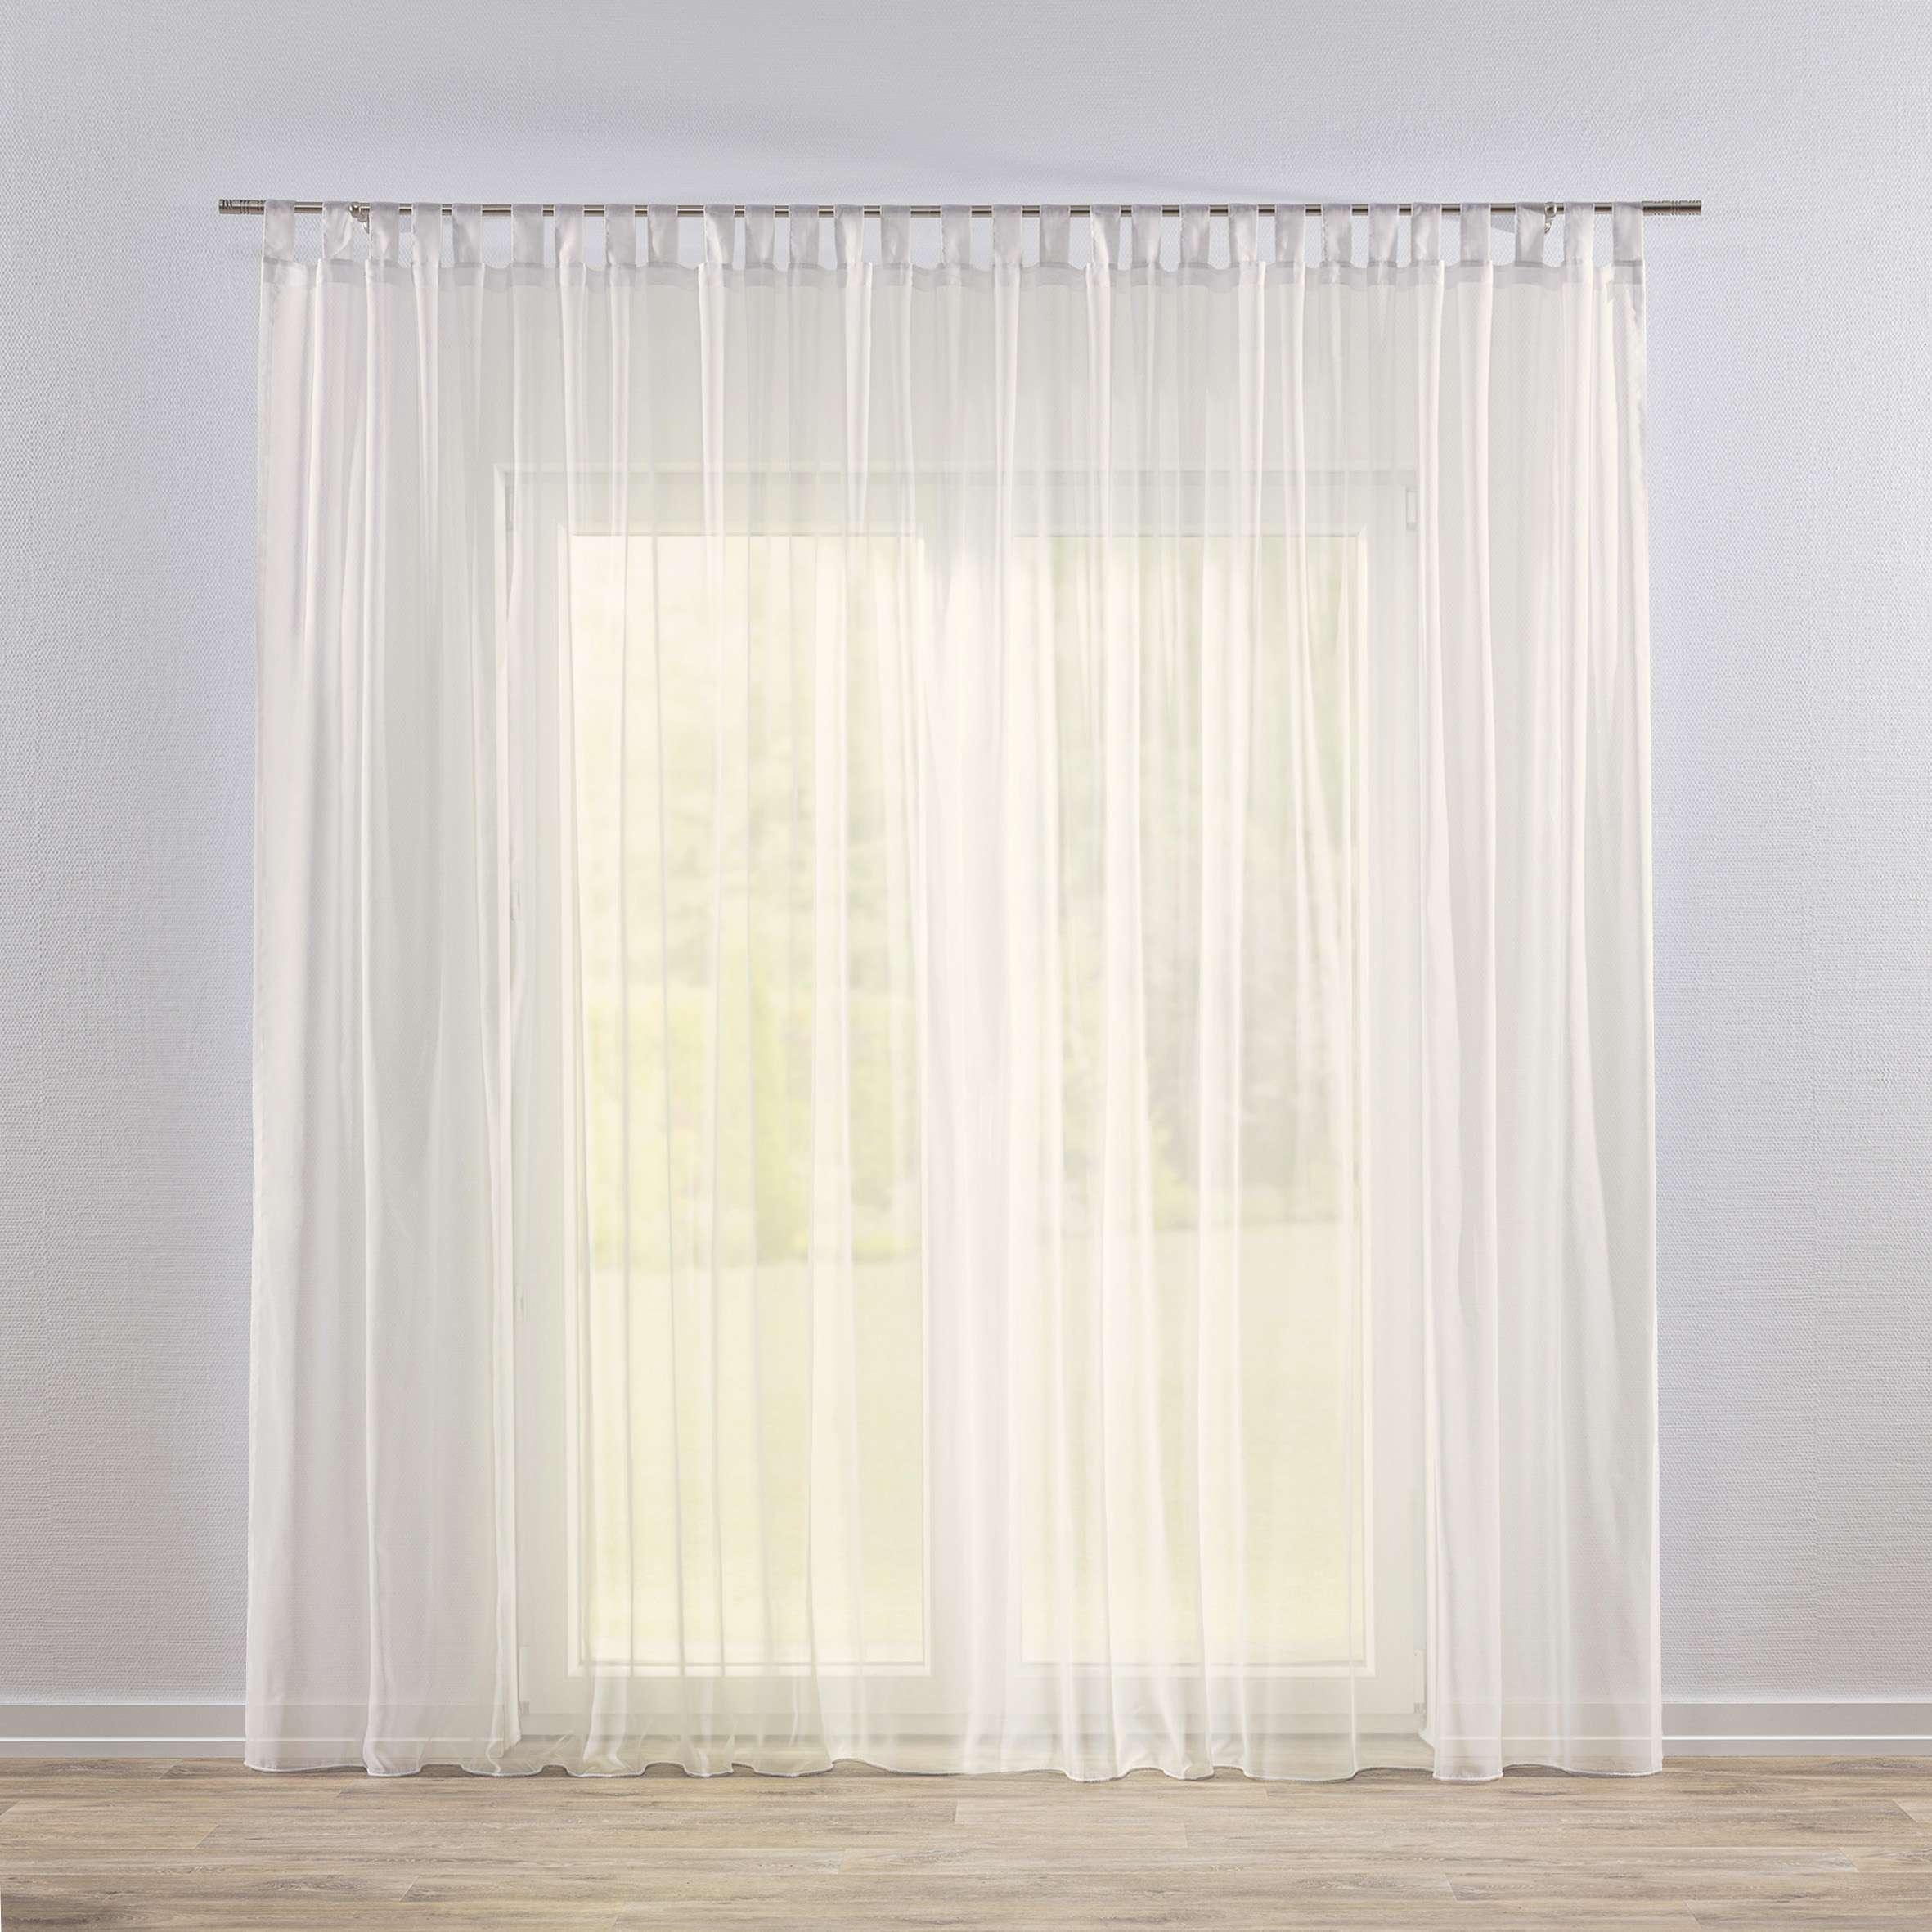 Záclona z voálu na pútkach V kolekcii Voálové záclony, tkanina: 901-01